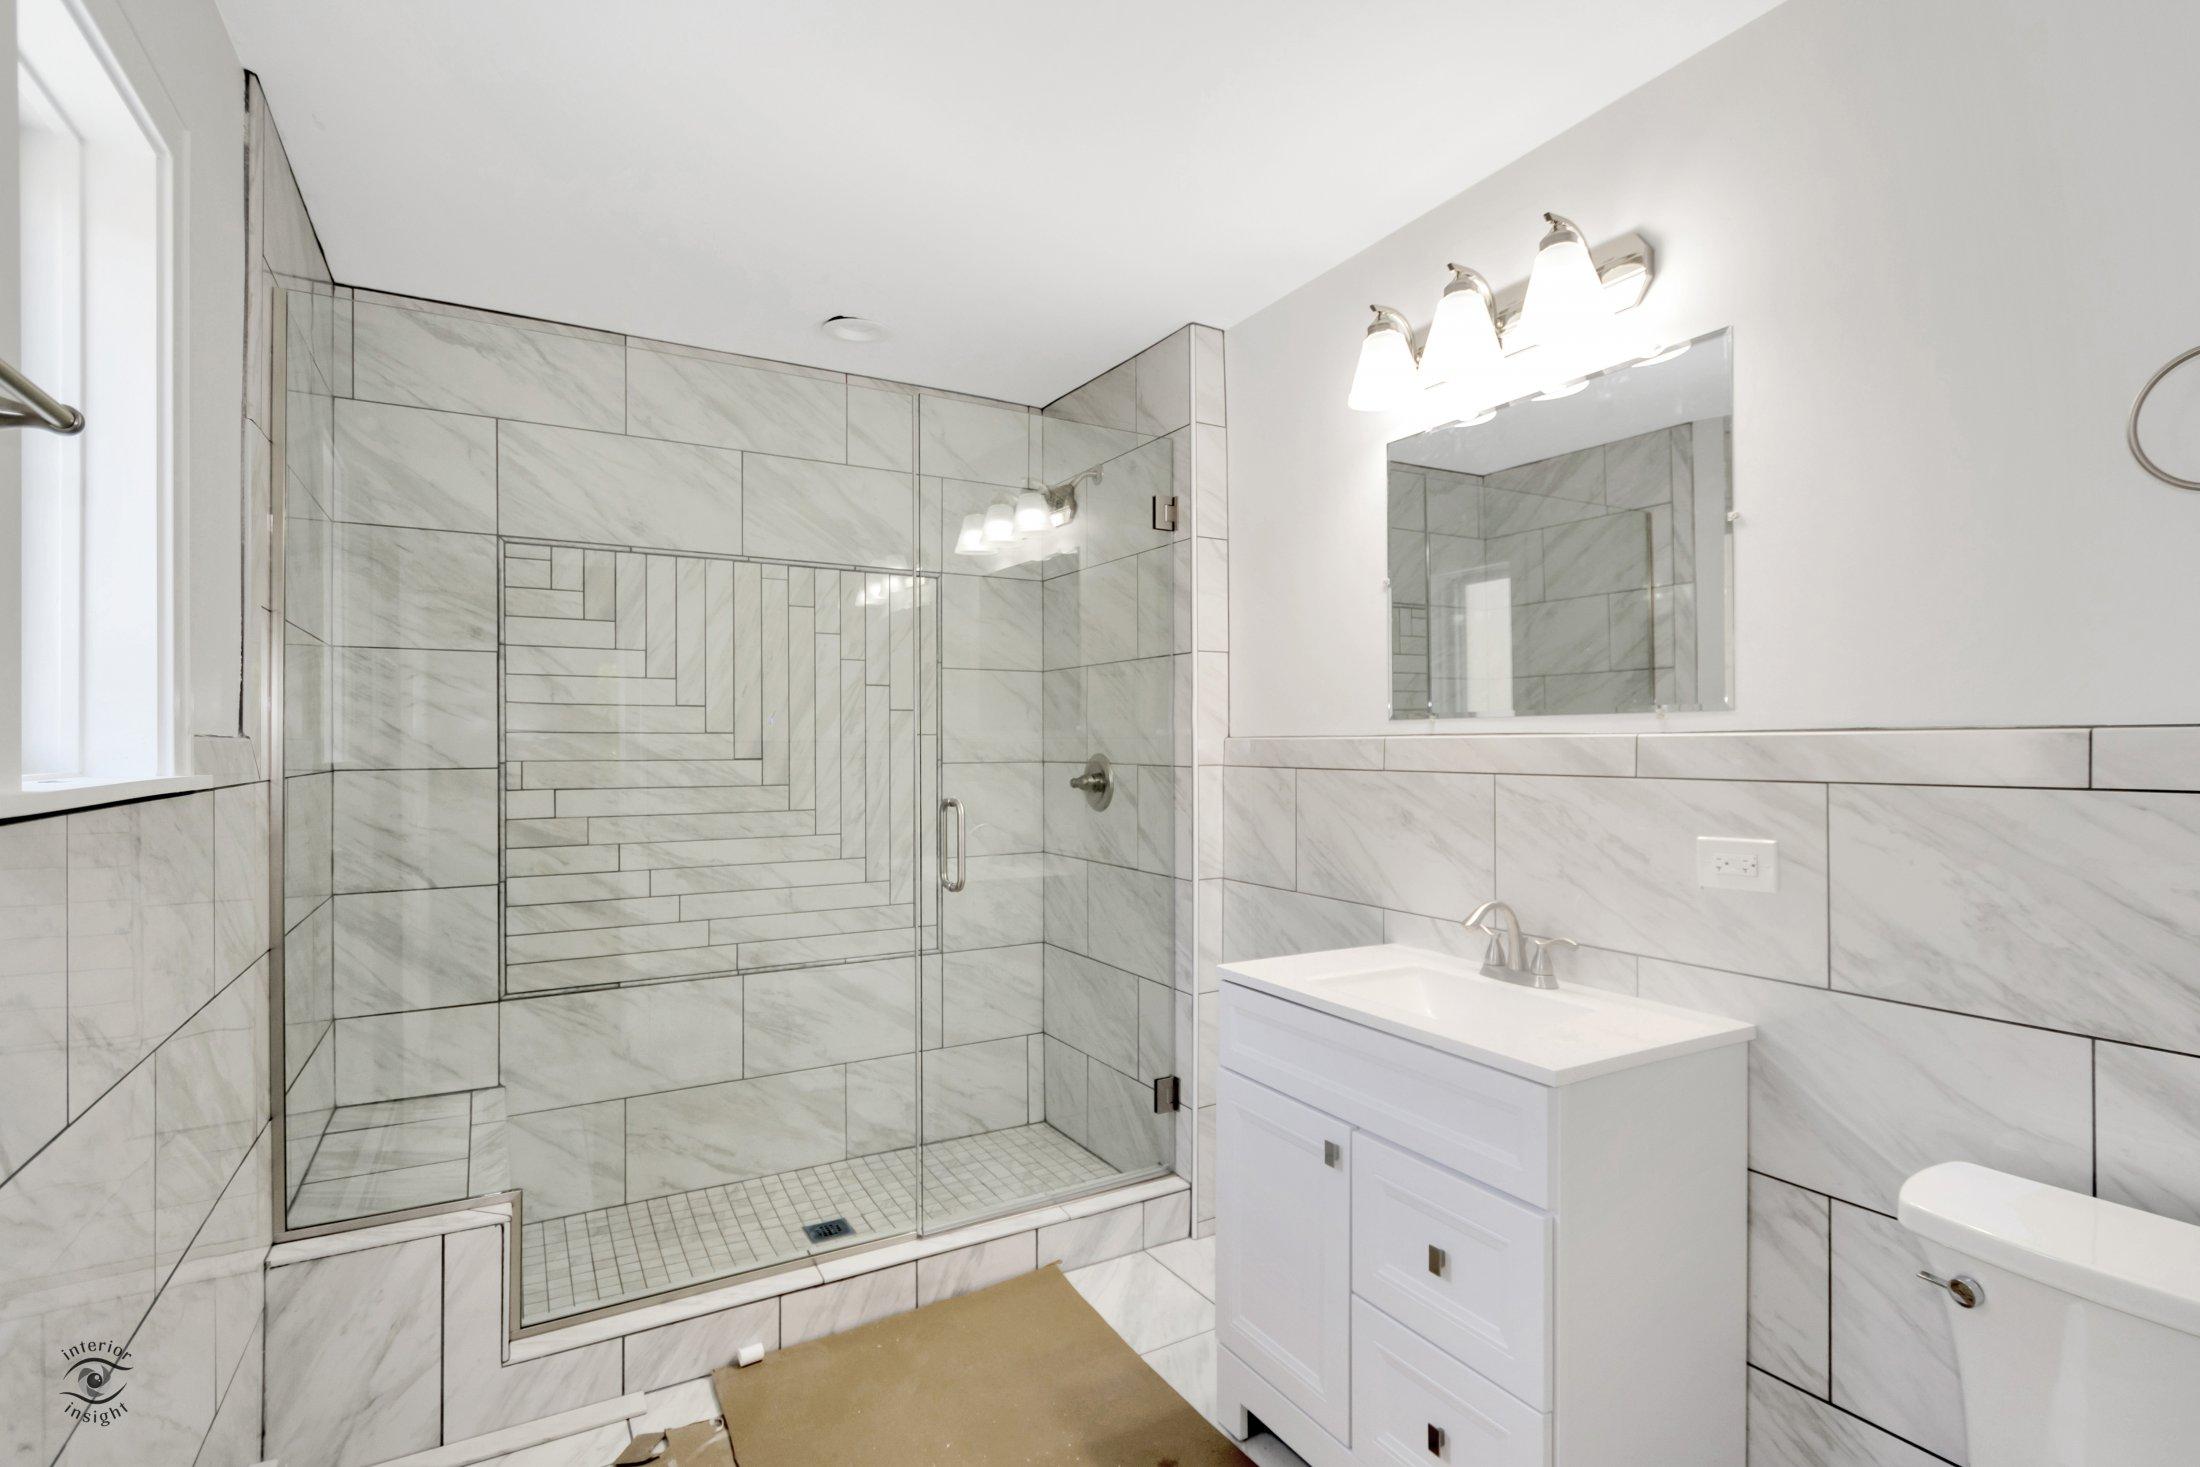 Unit 1 Master Bathroom (1)